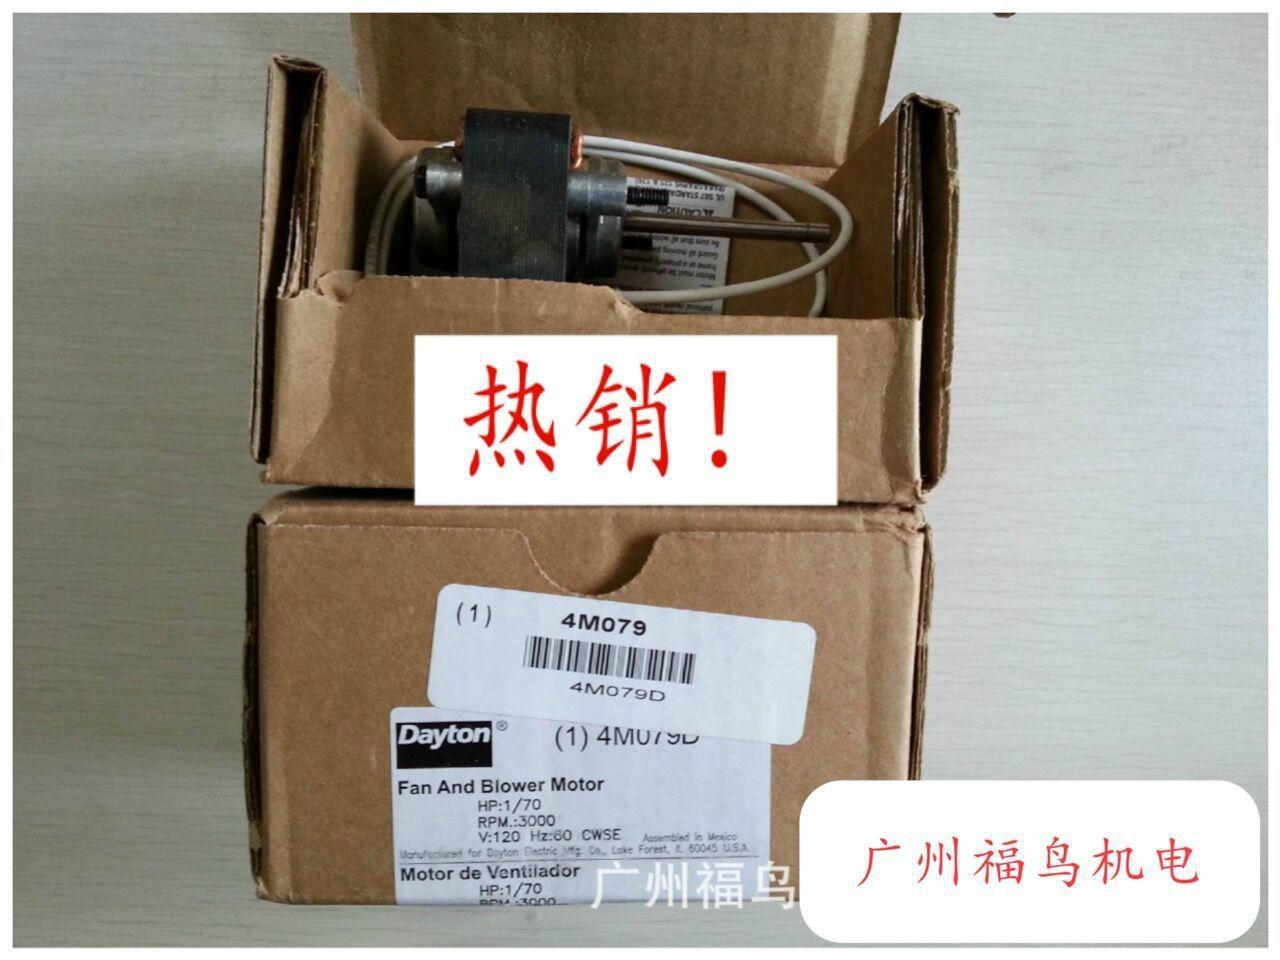 DAYTON电机  型号: 4M079D